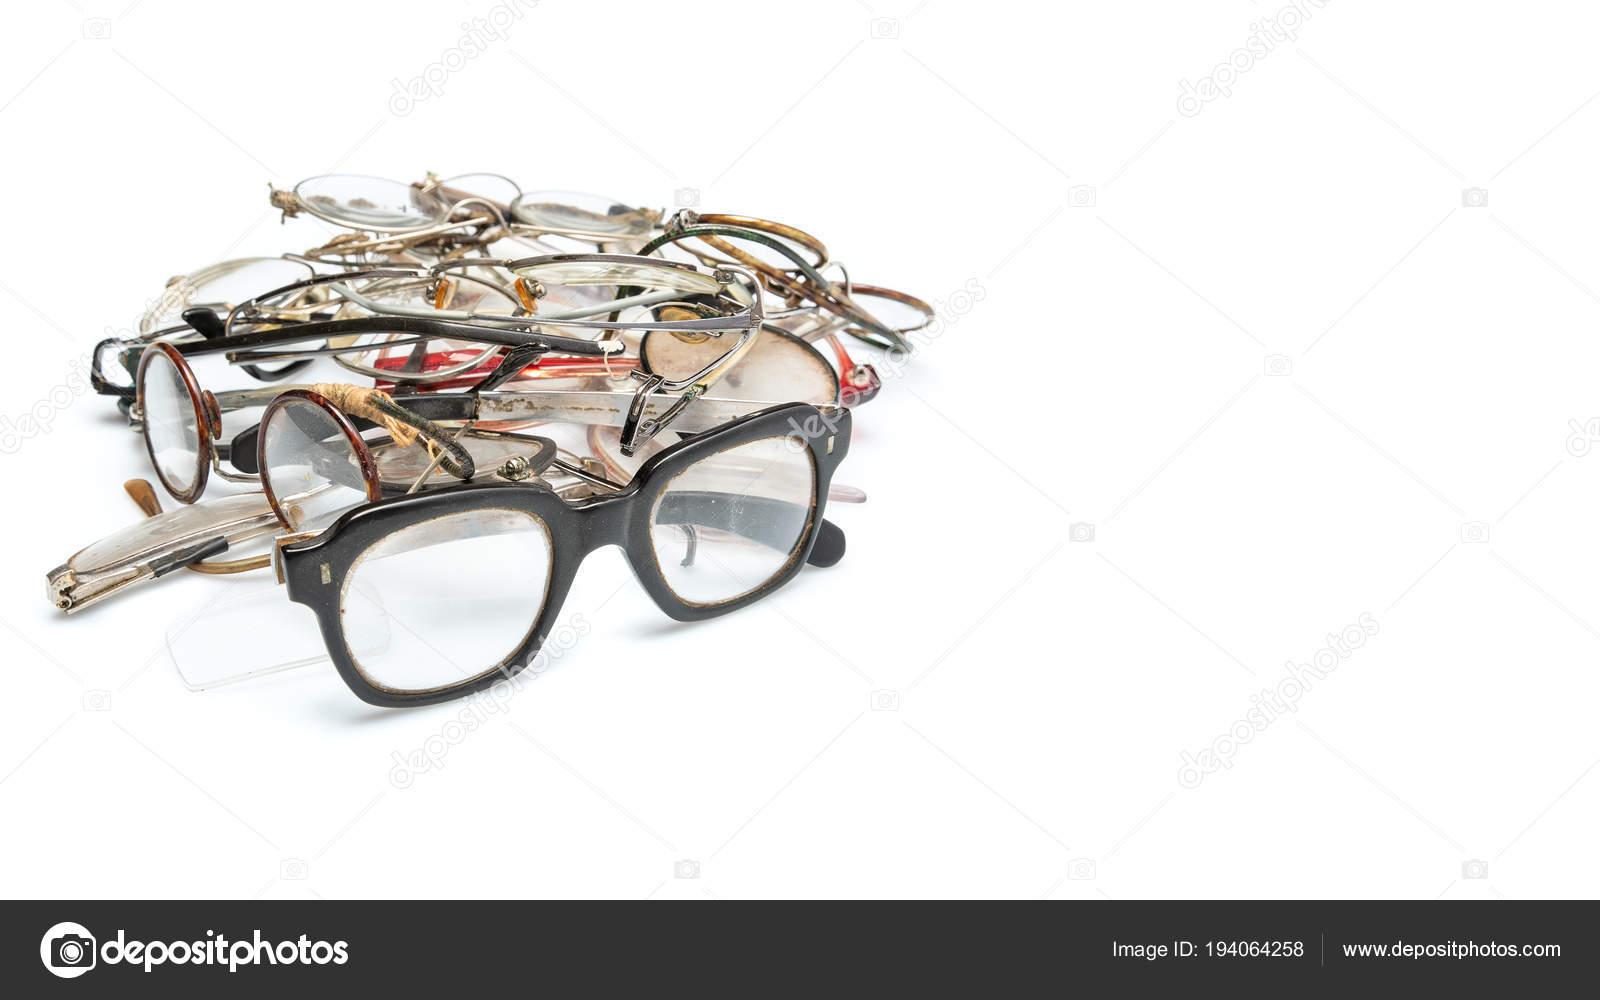 f5c6c548e7 When you re done with your old pair of glasses